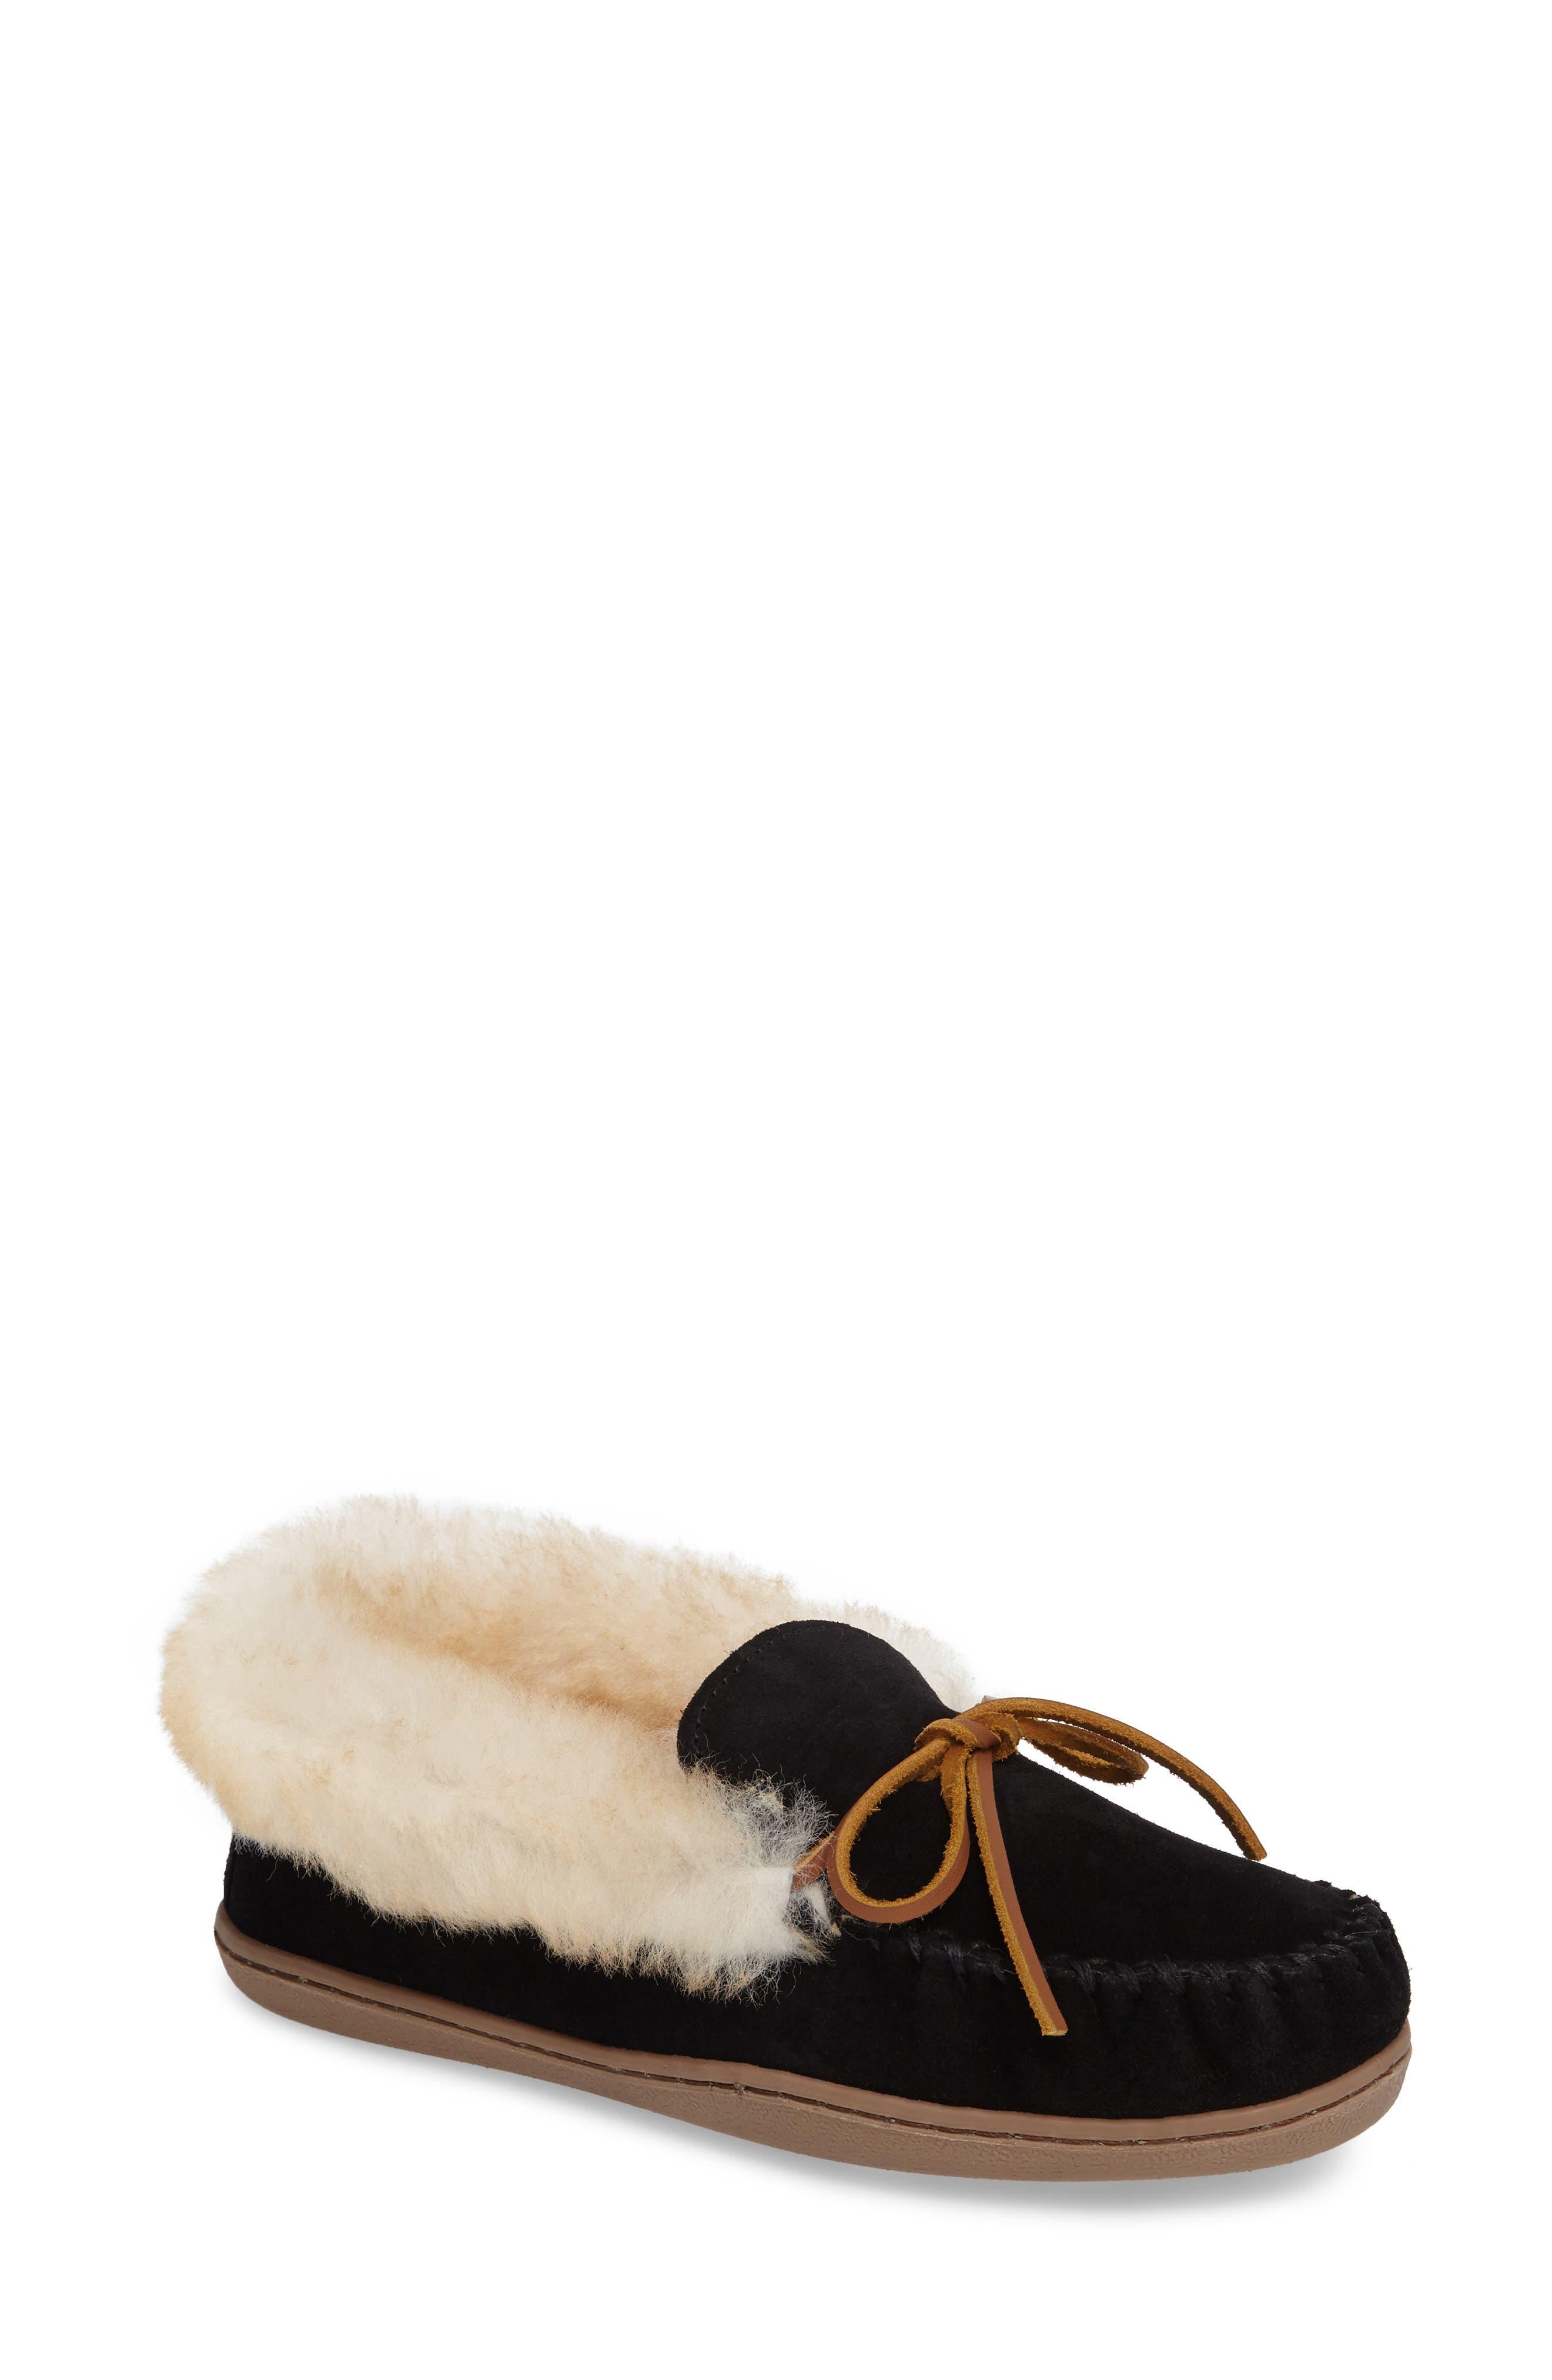 MINNETONKA Alpine Genuine Shearling Slipper, Main, color, BLACK